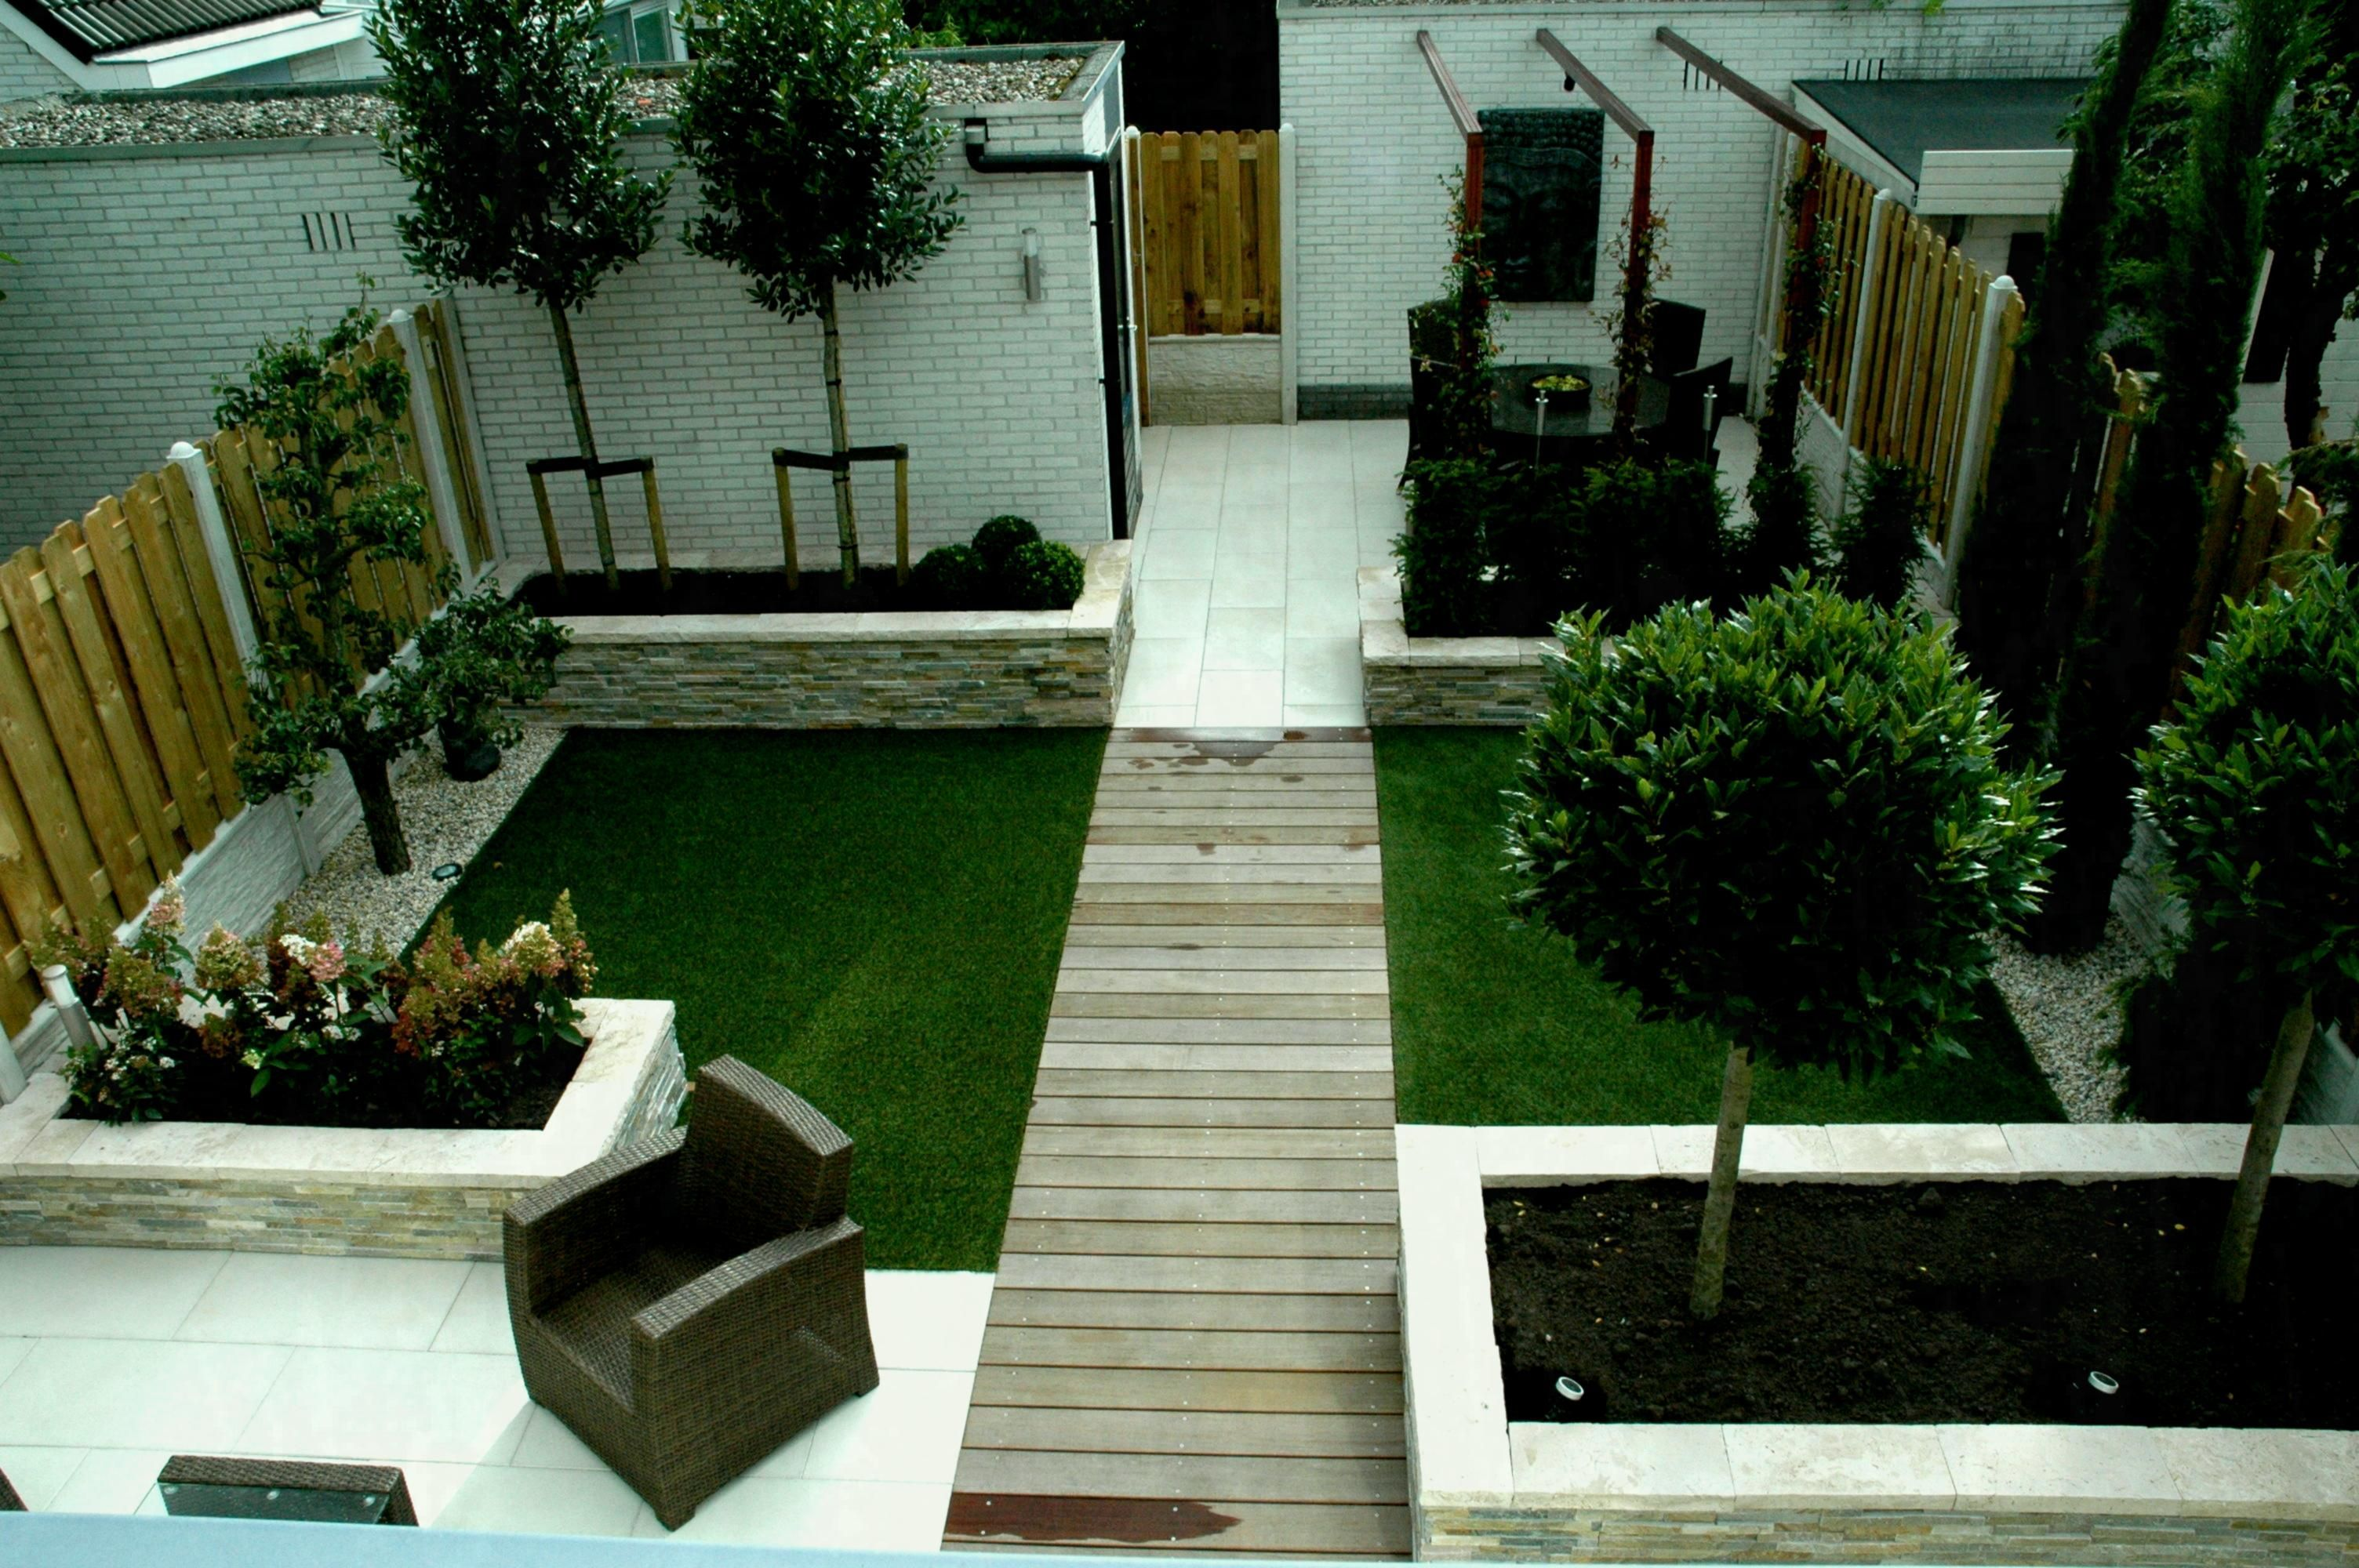 47 Small Garden Design Ideas Low Maintenance Https Silahsilah Com Design 47 Small Garden Low Maintenance Garden Design No Grass Backyard Small Garden Design